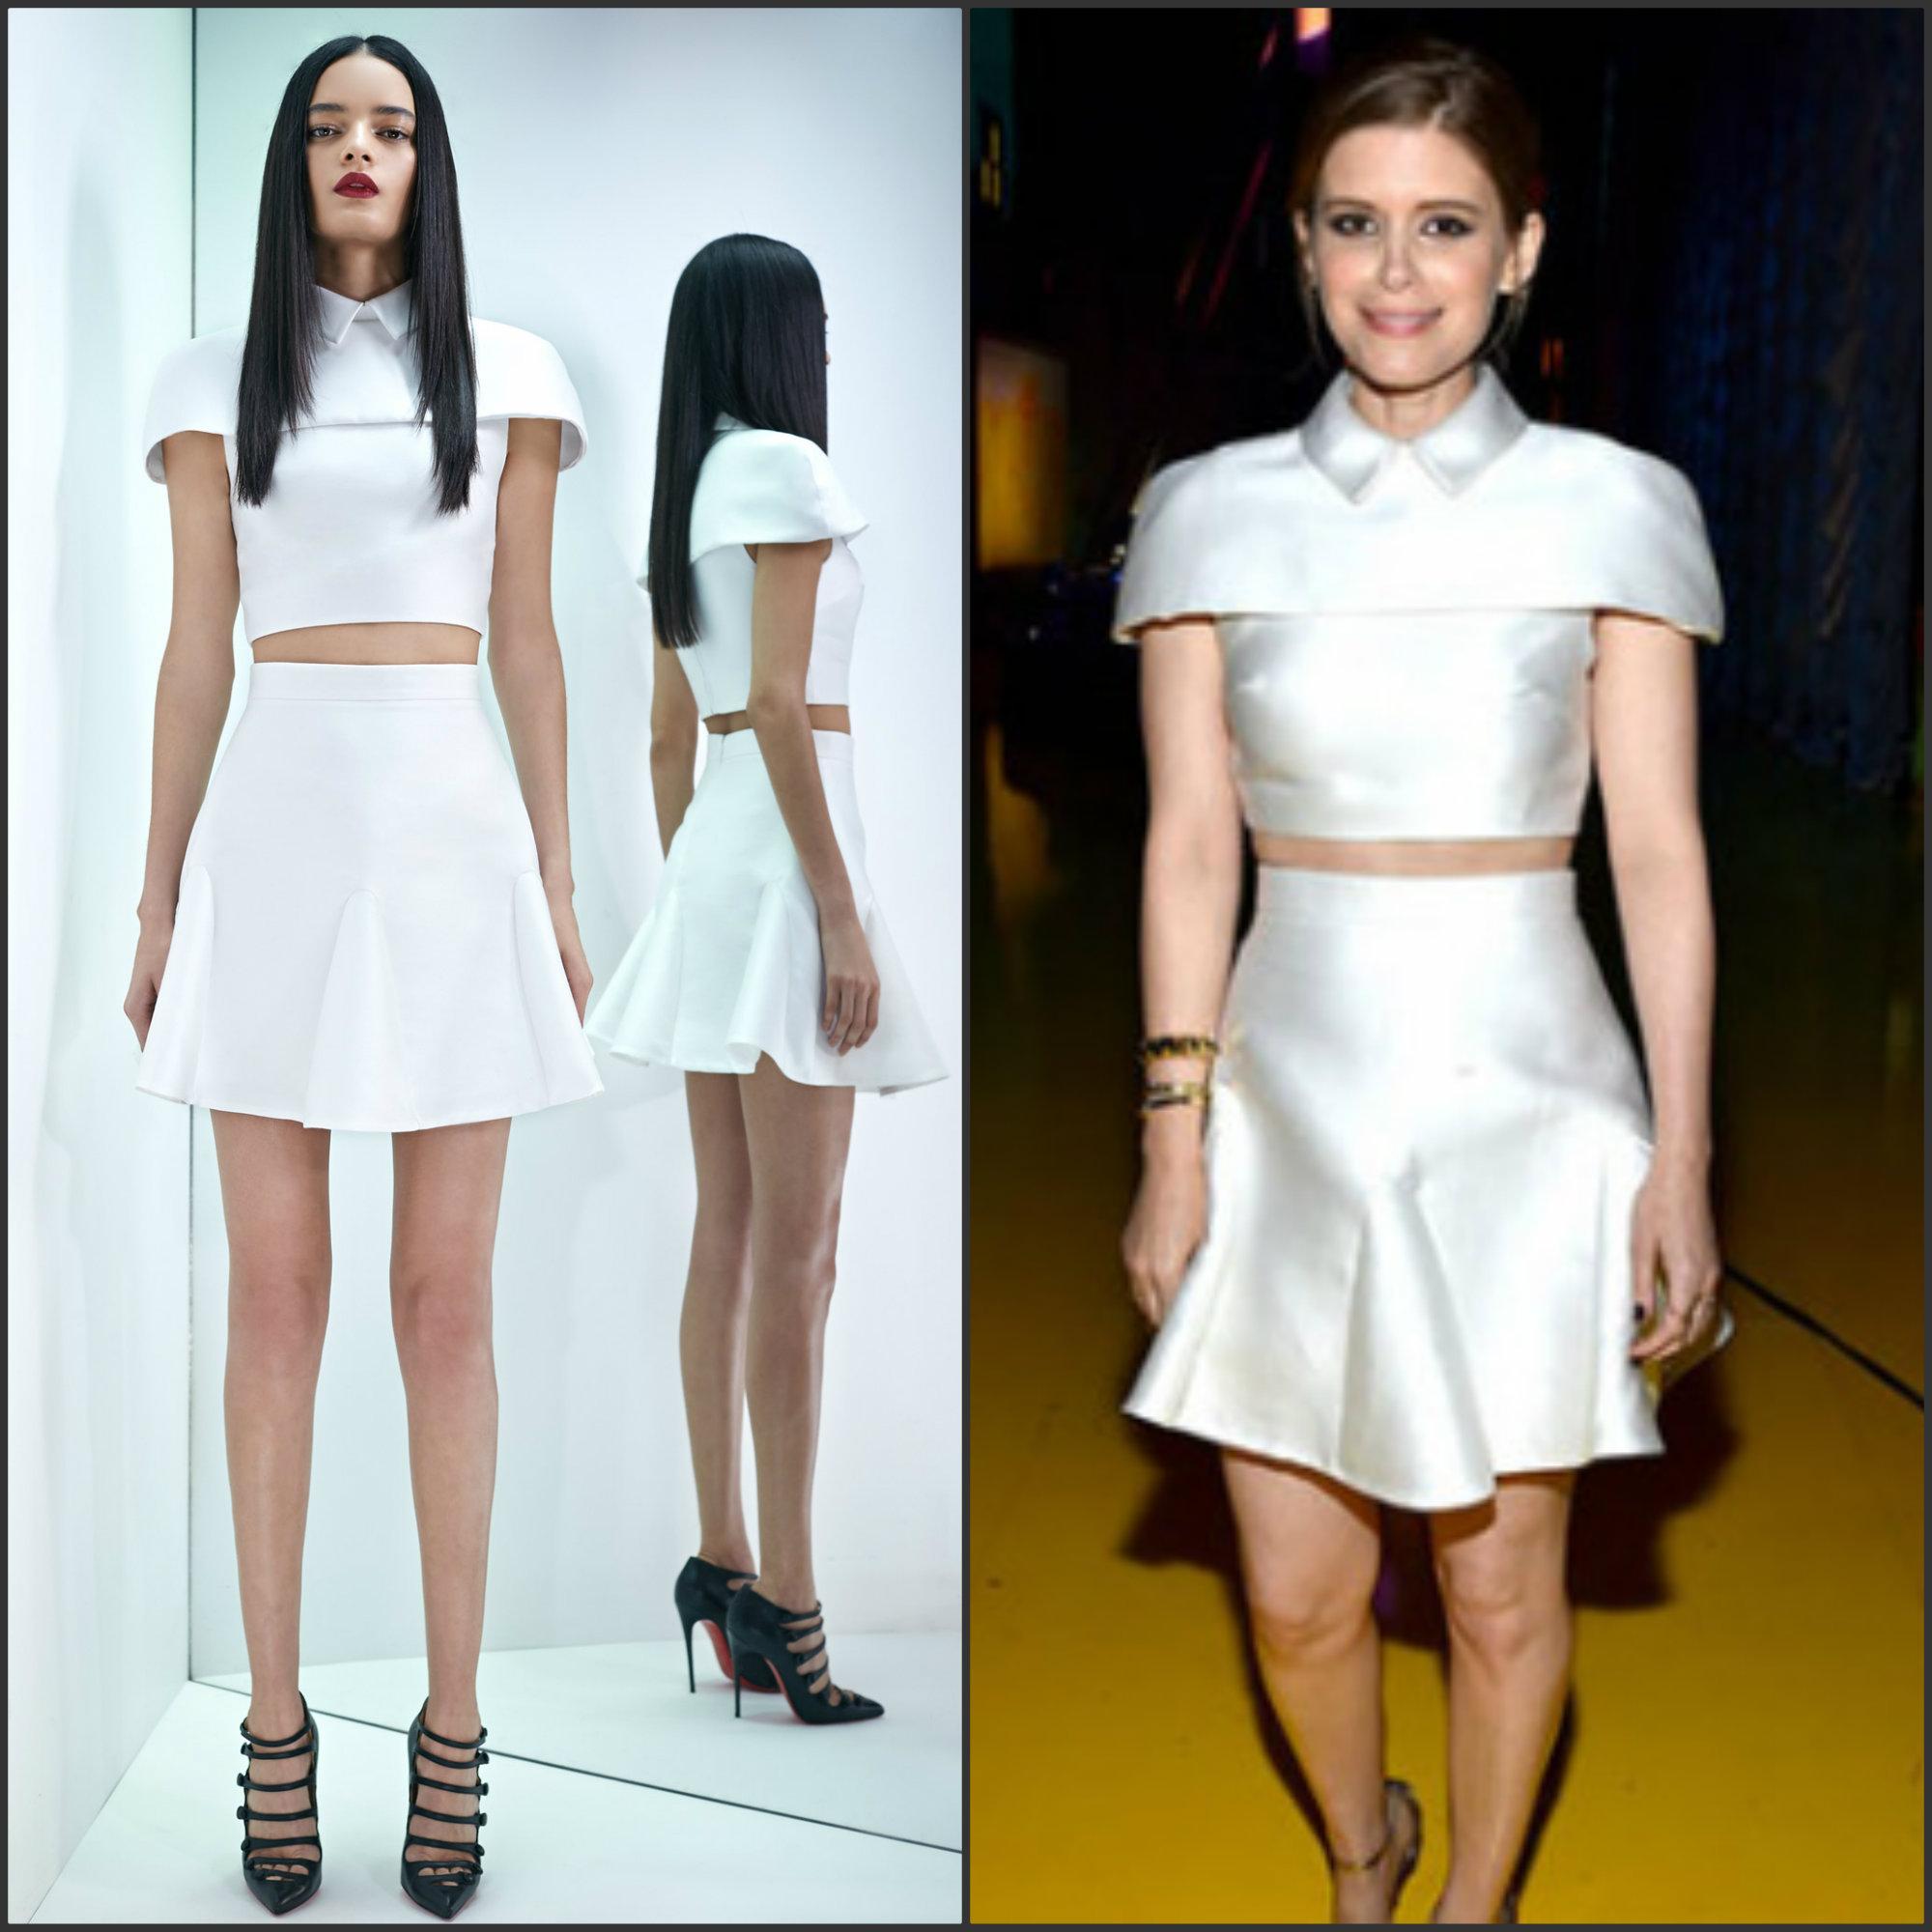 Kate-Mara-in-Cushnie-et-Ochs-2015-MTV-Movie-Awards